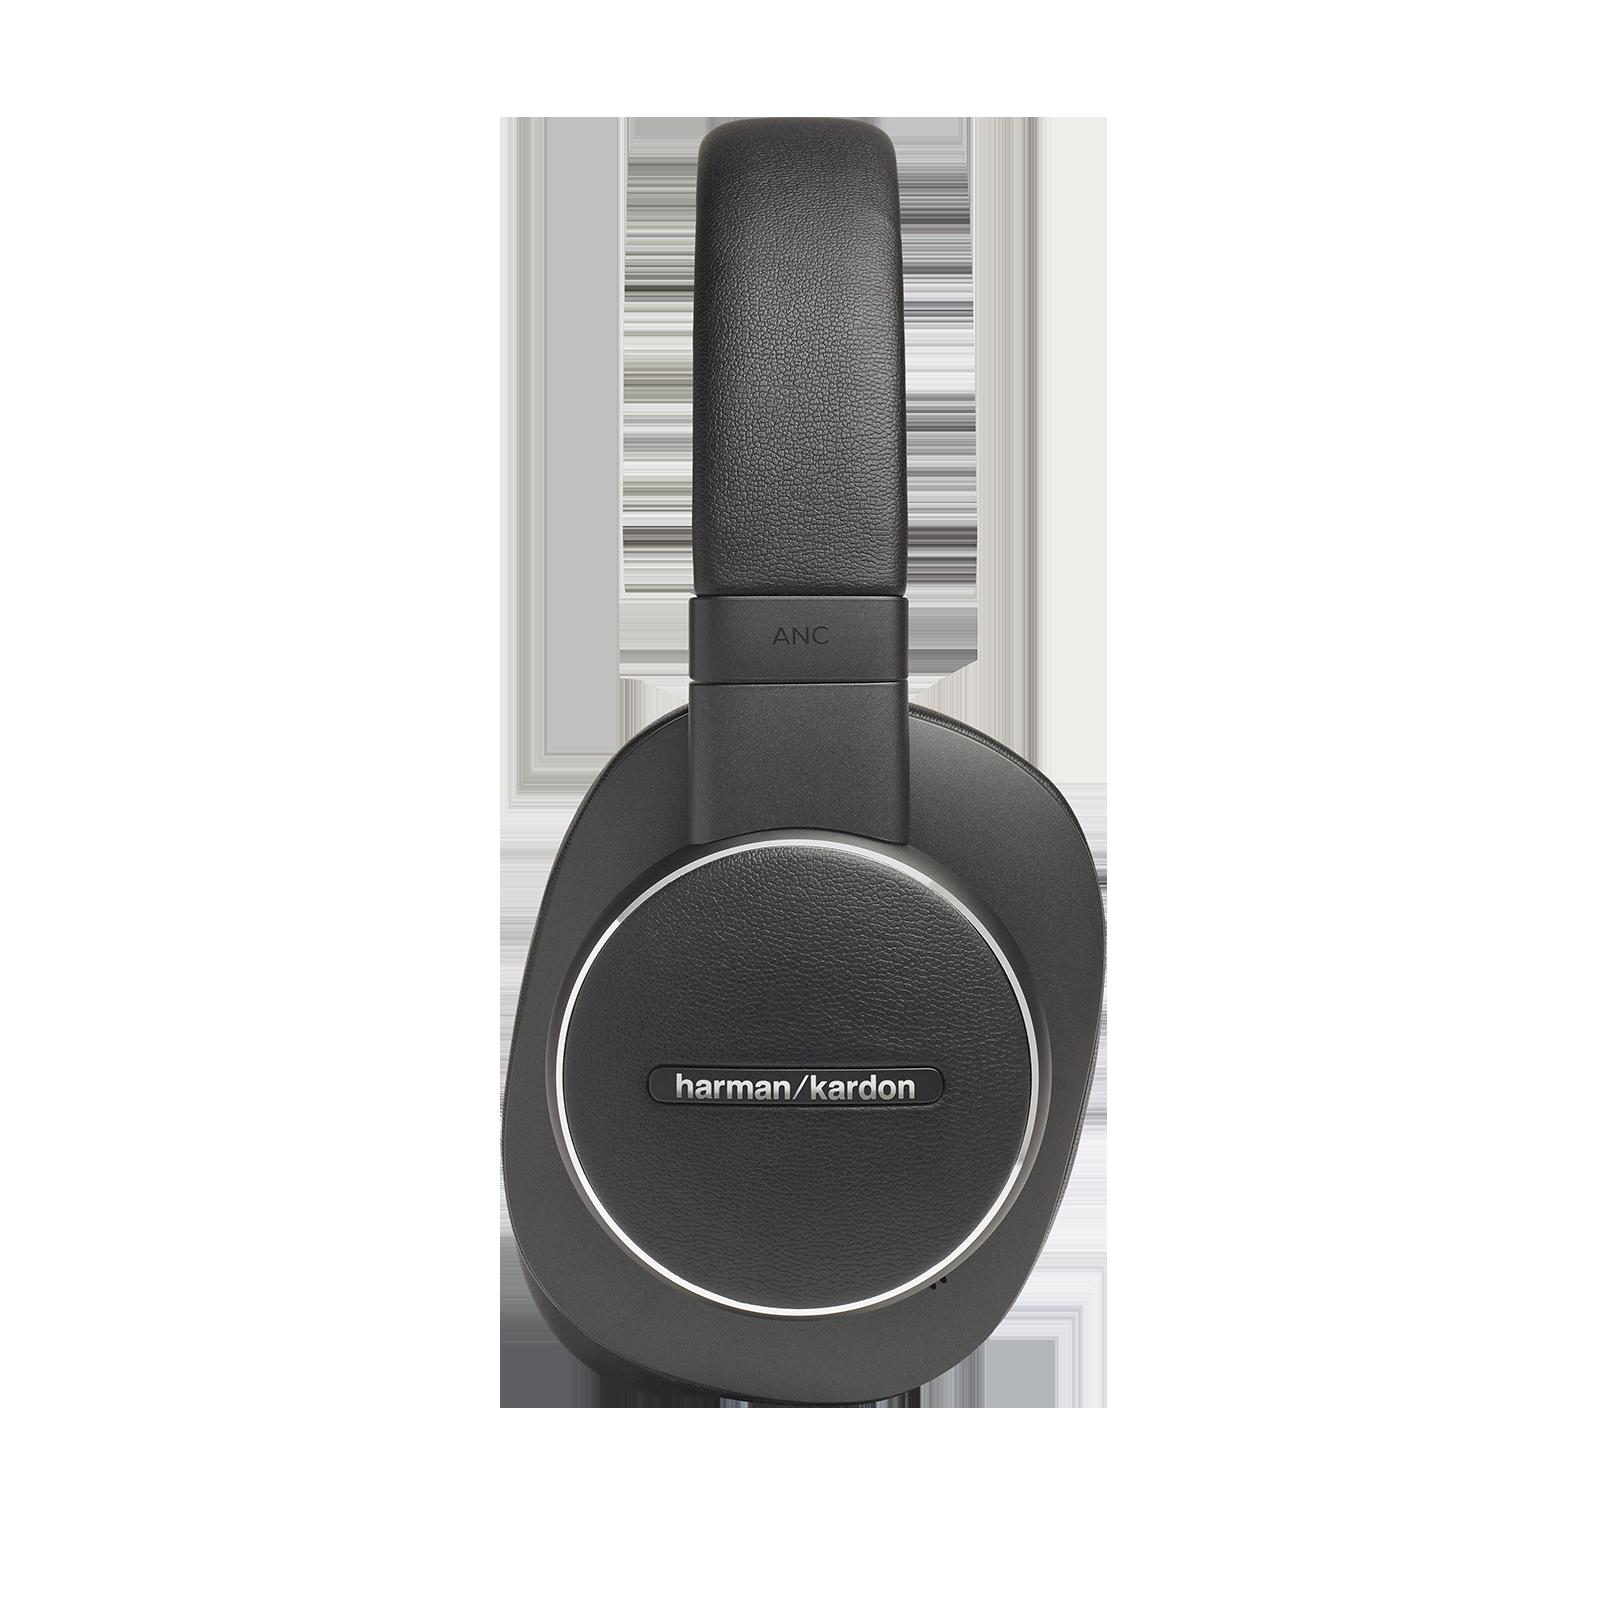 Harman Kardon FLY ANC - Black - Wireless Over-Ear NC Headphones - Detailshot 6